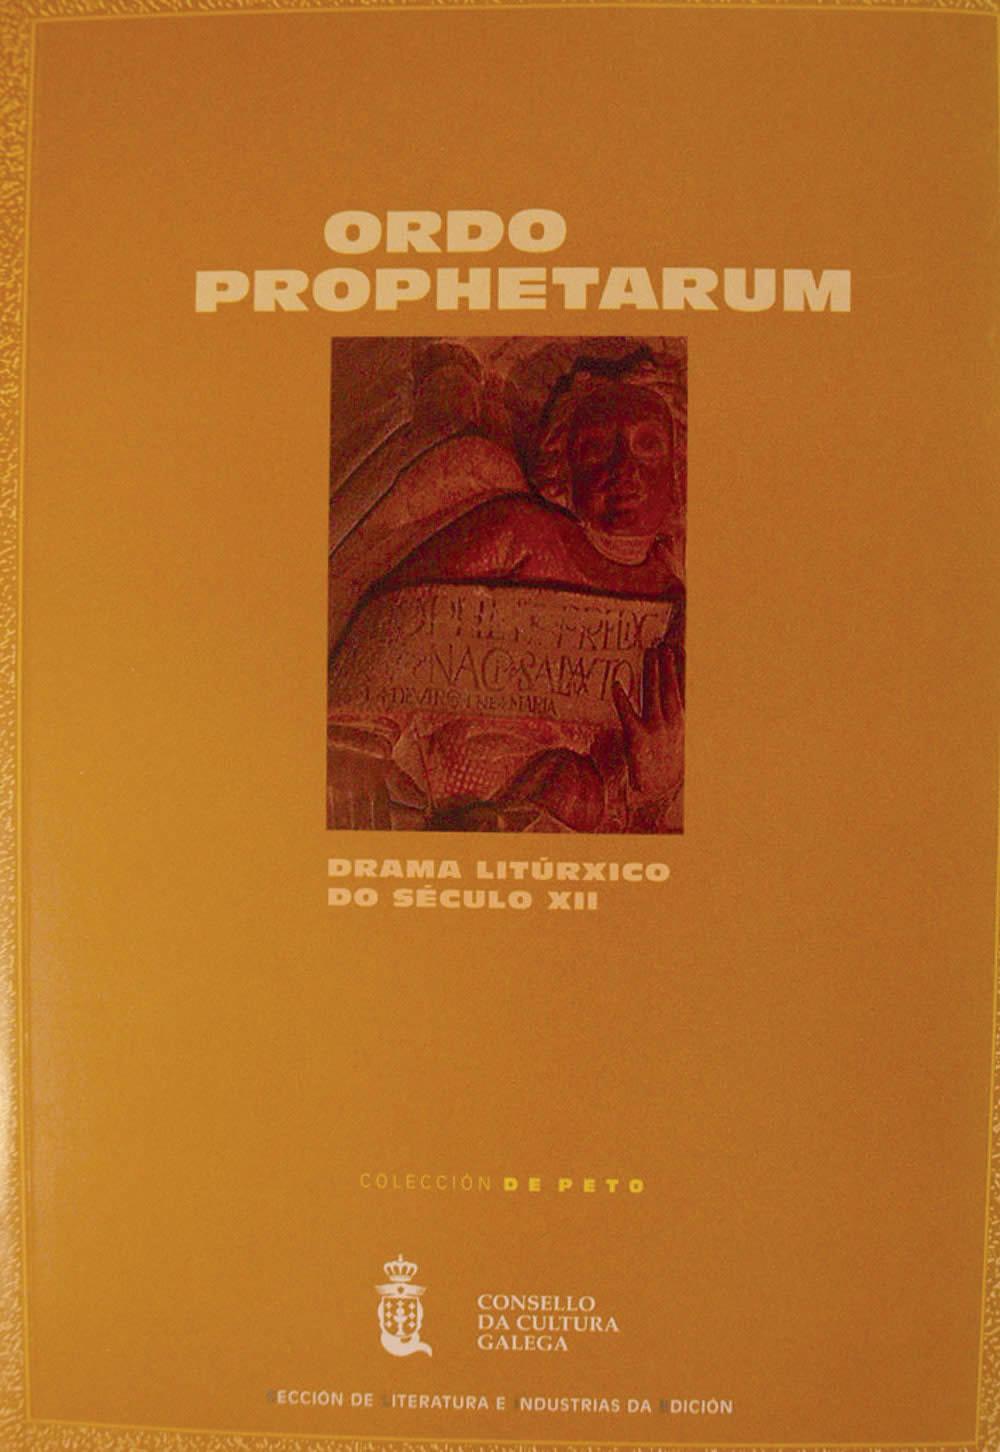 Portada de  Ordo prophetarum